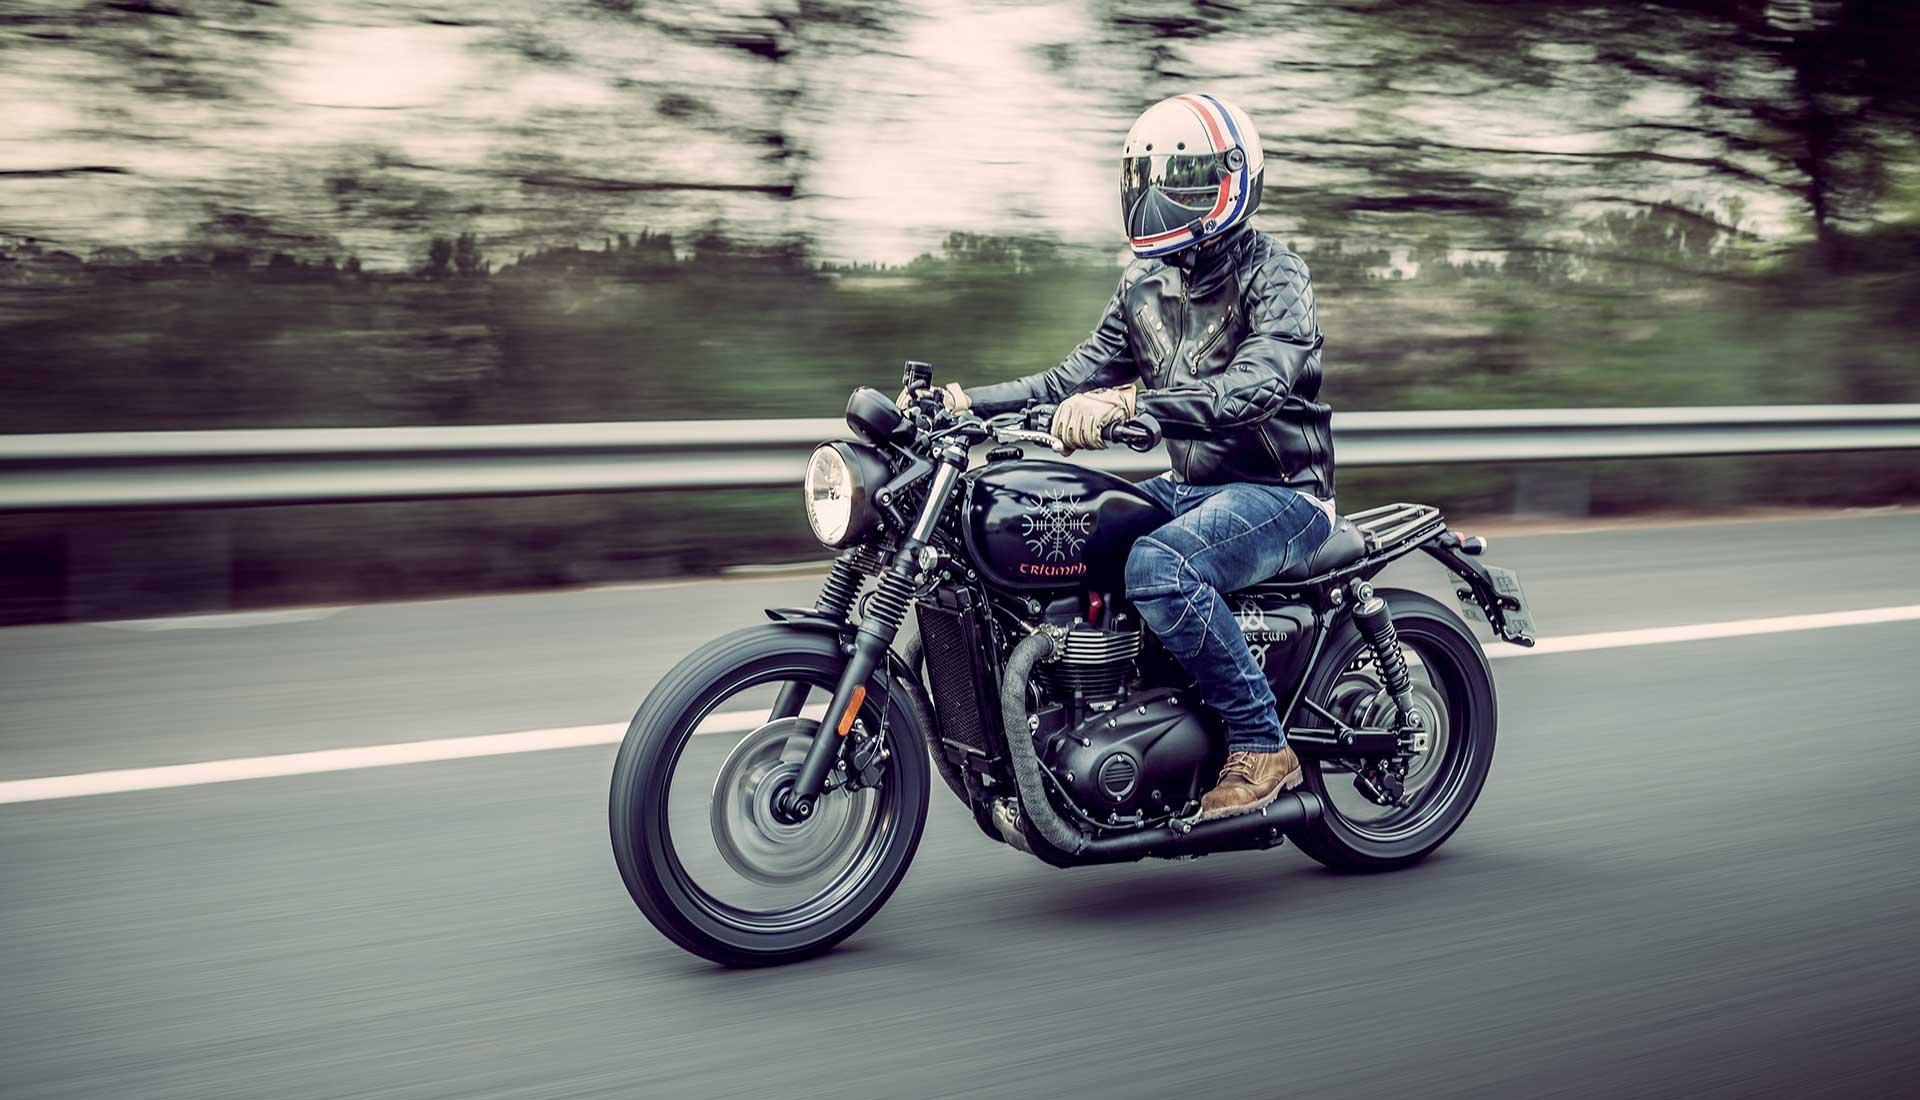 Fotos de motos Jerez - BratStyle CoolMotorcycles